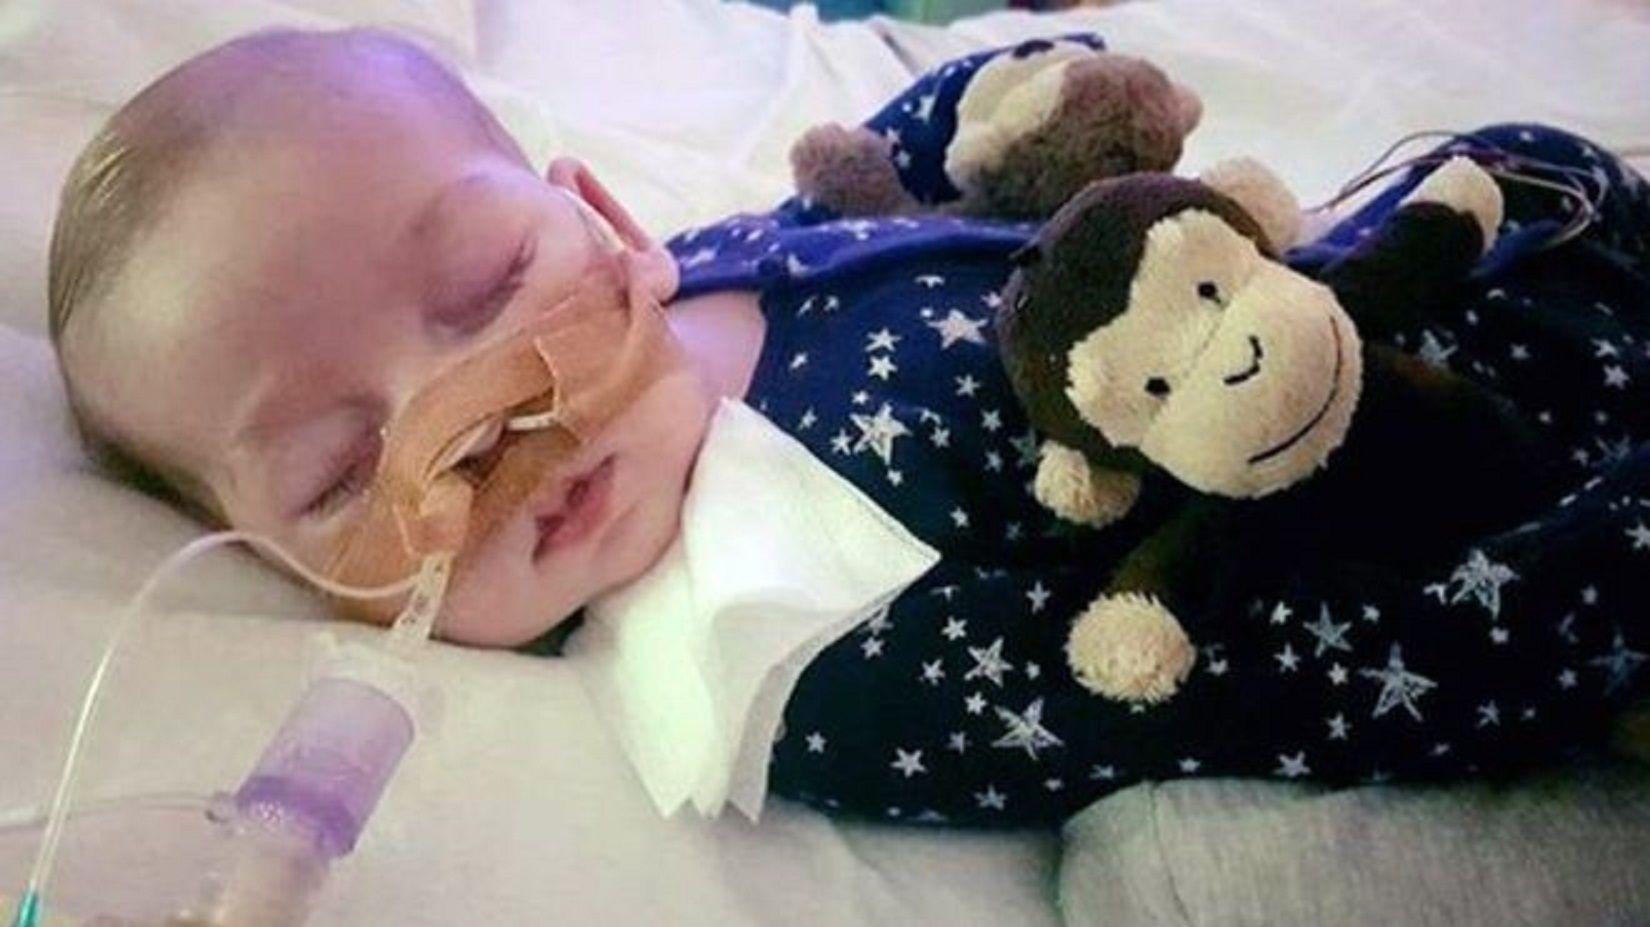 Reino Unido: la Justicia ordenó desconectar a un bebé de 8 meses